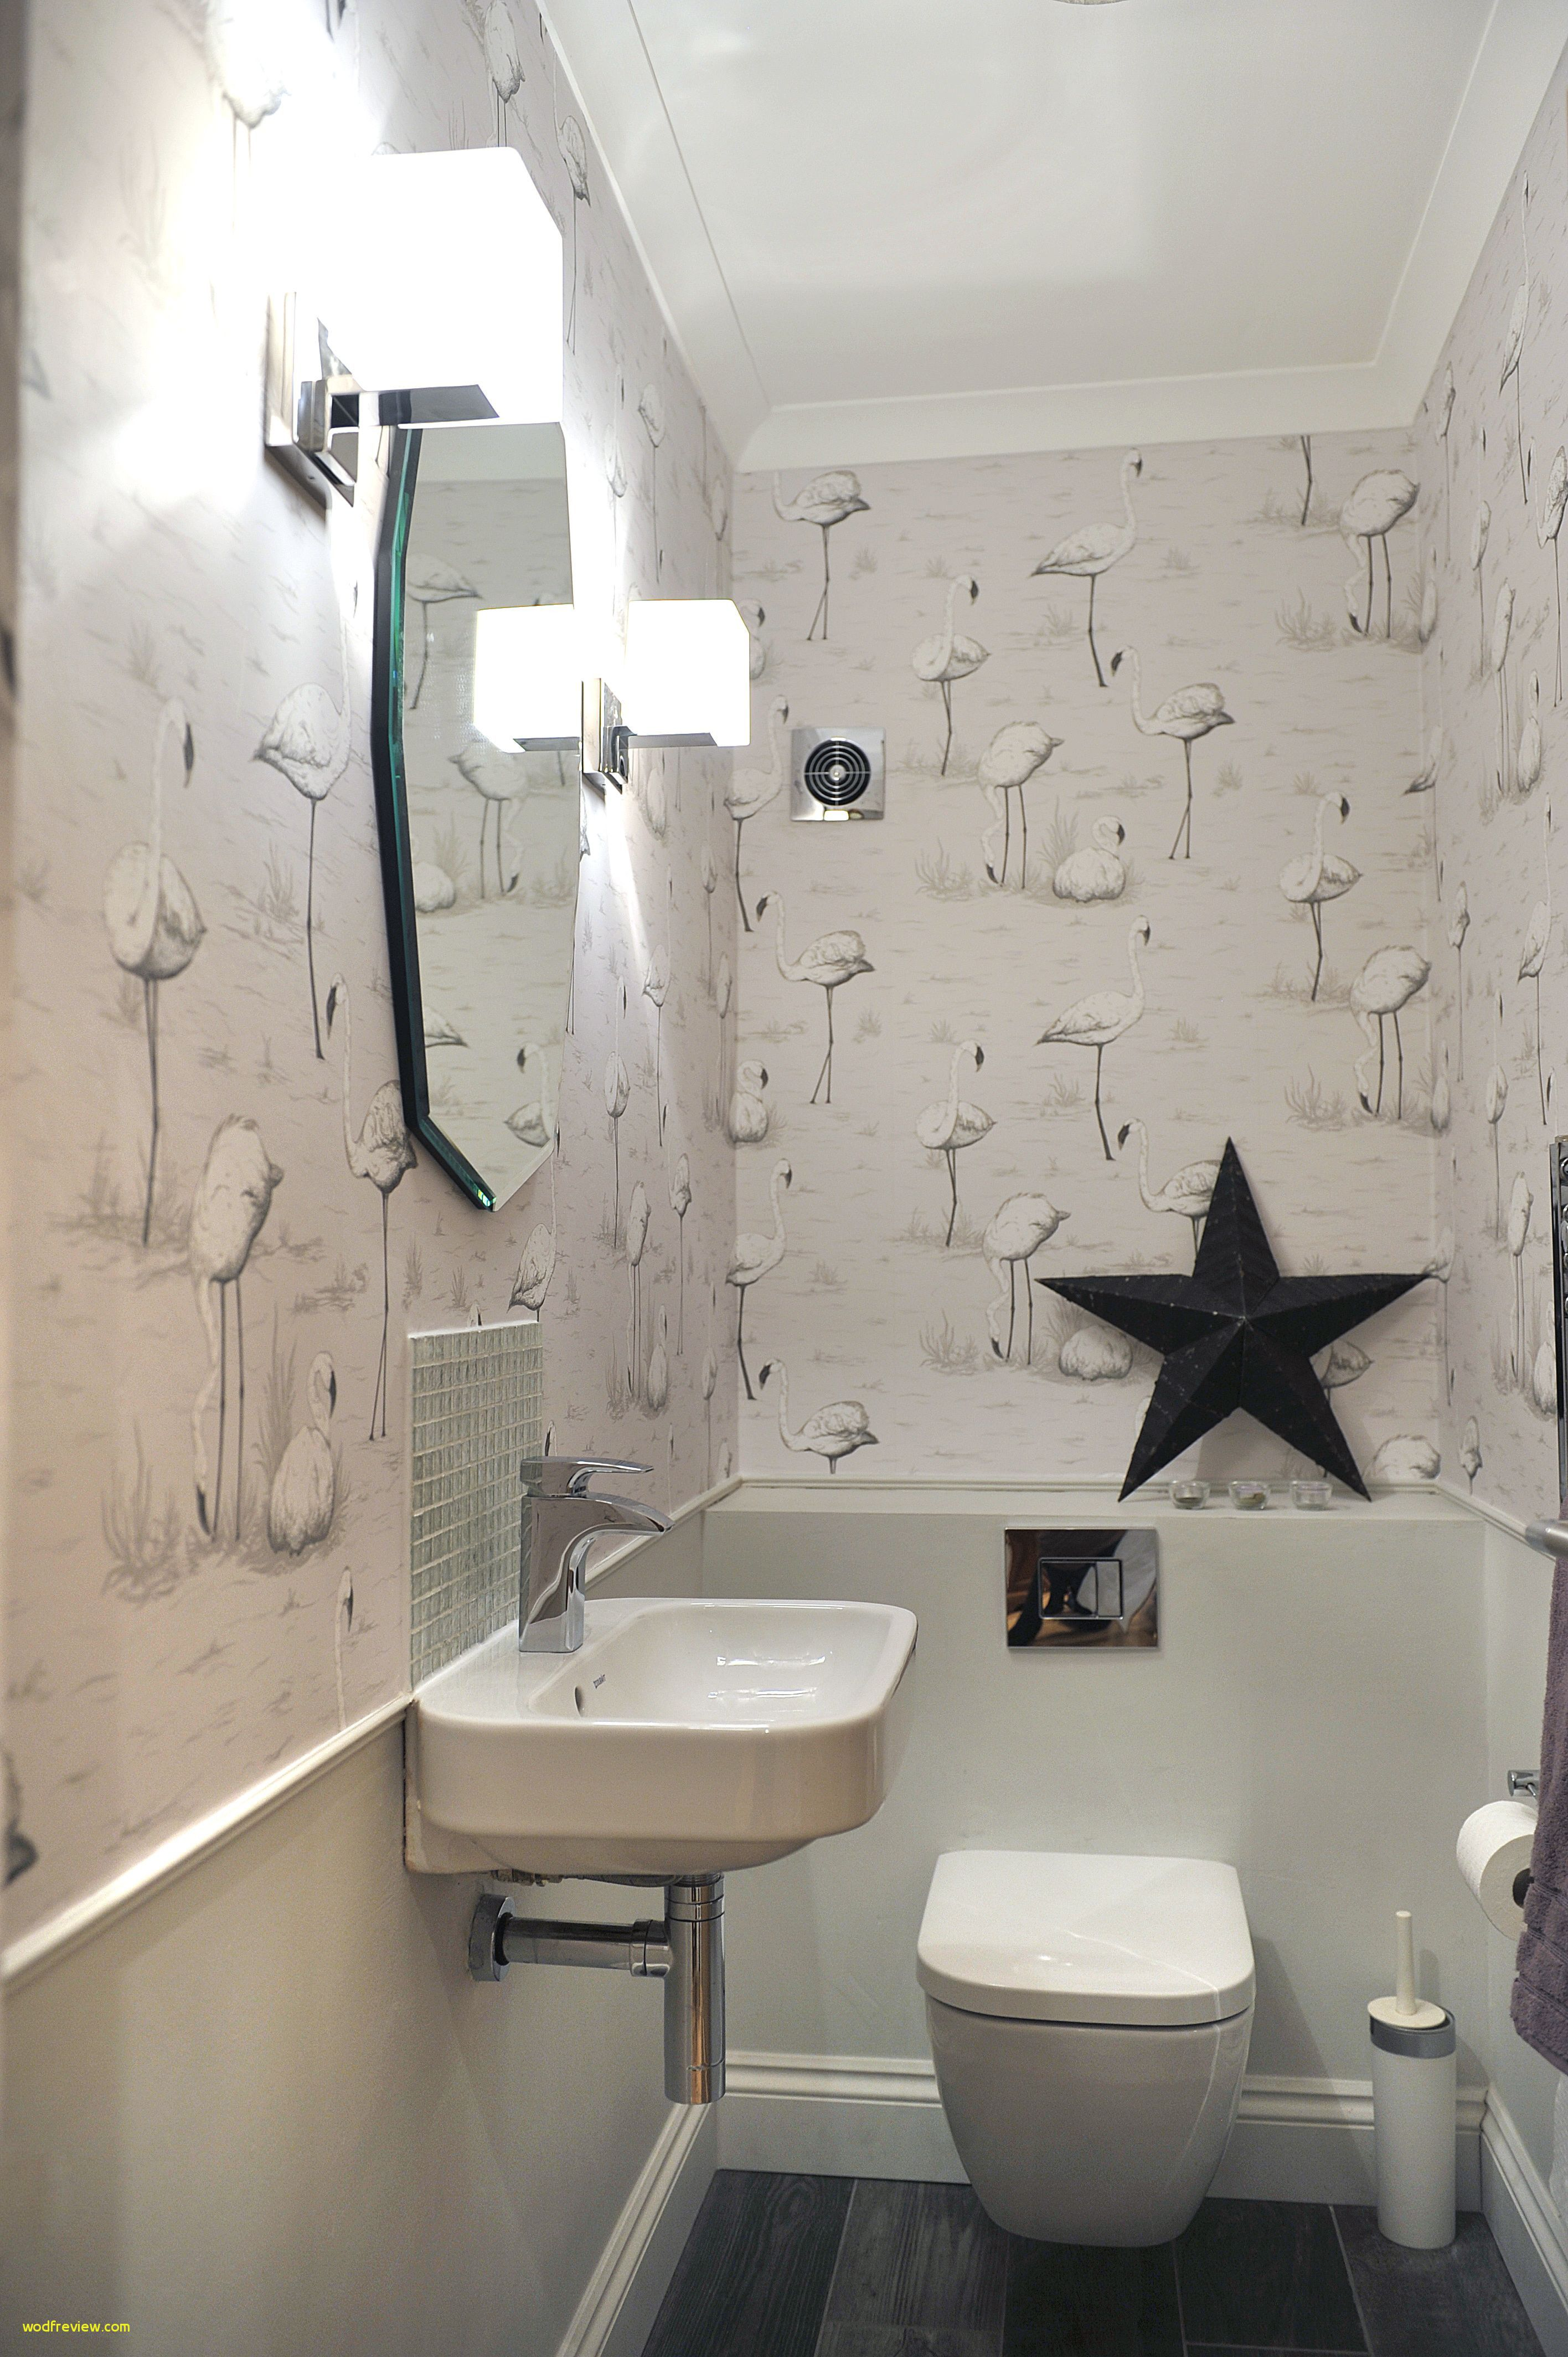 Cool Bathroom Renovations June 2018 Small Toilet Room Cloakroom Toilet Wallpaper Toilet